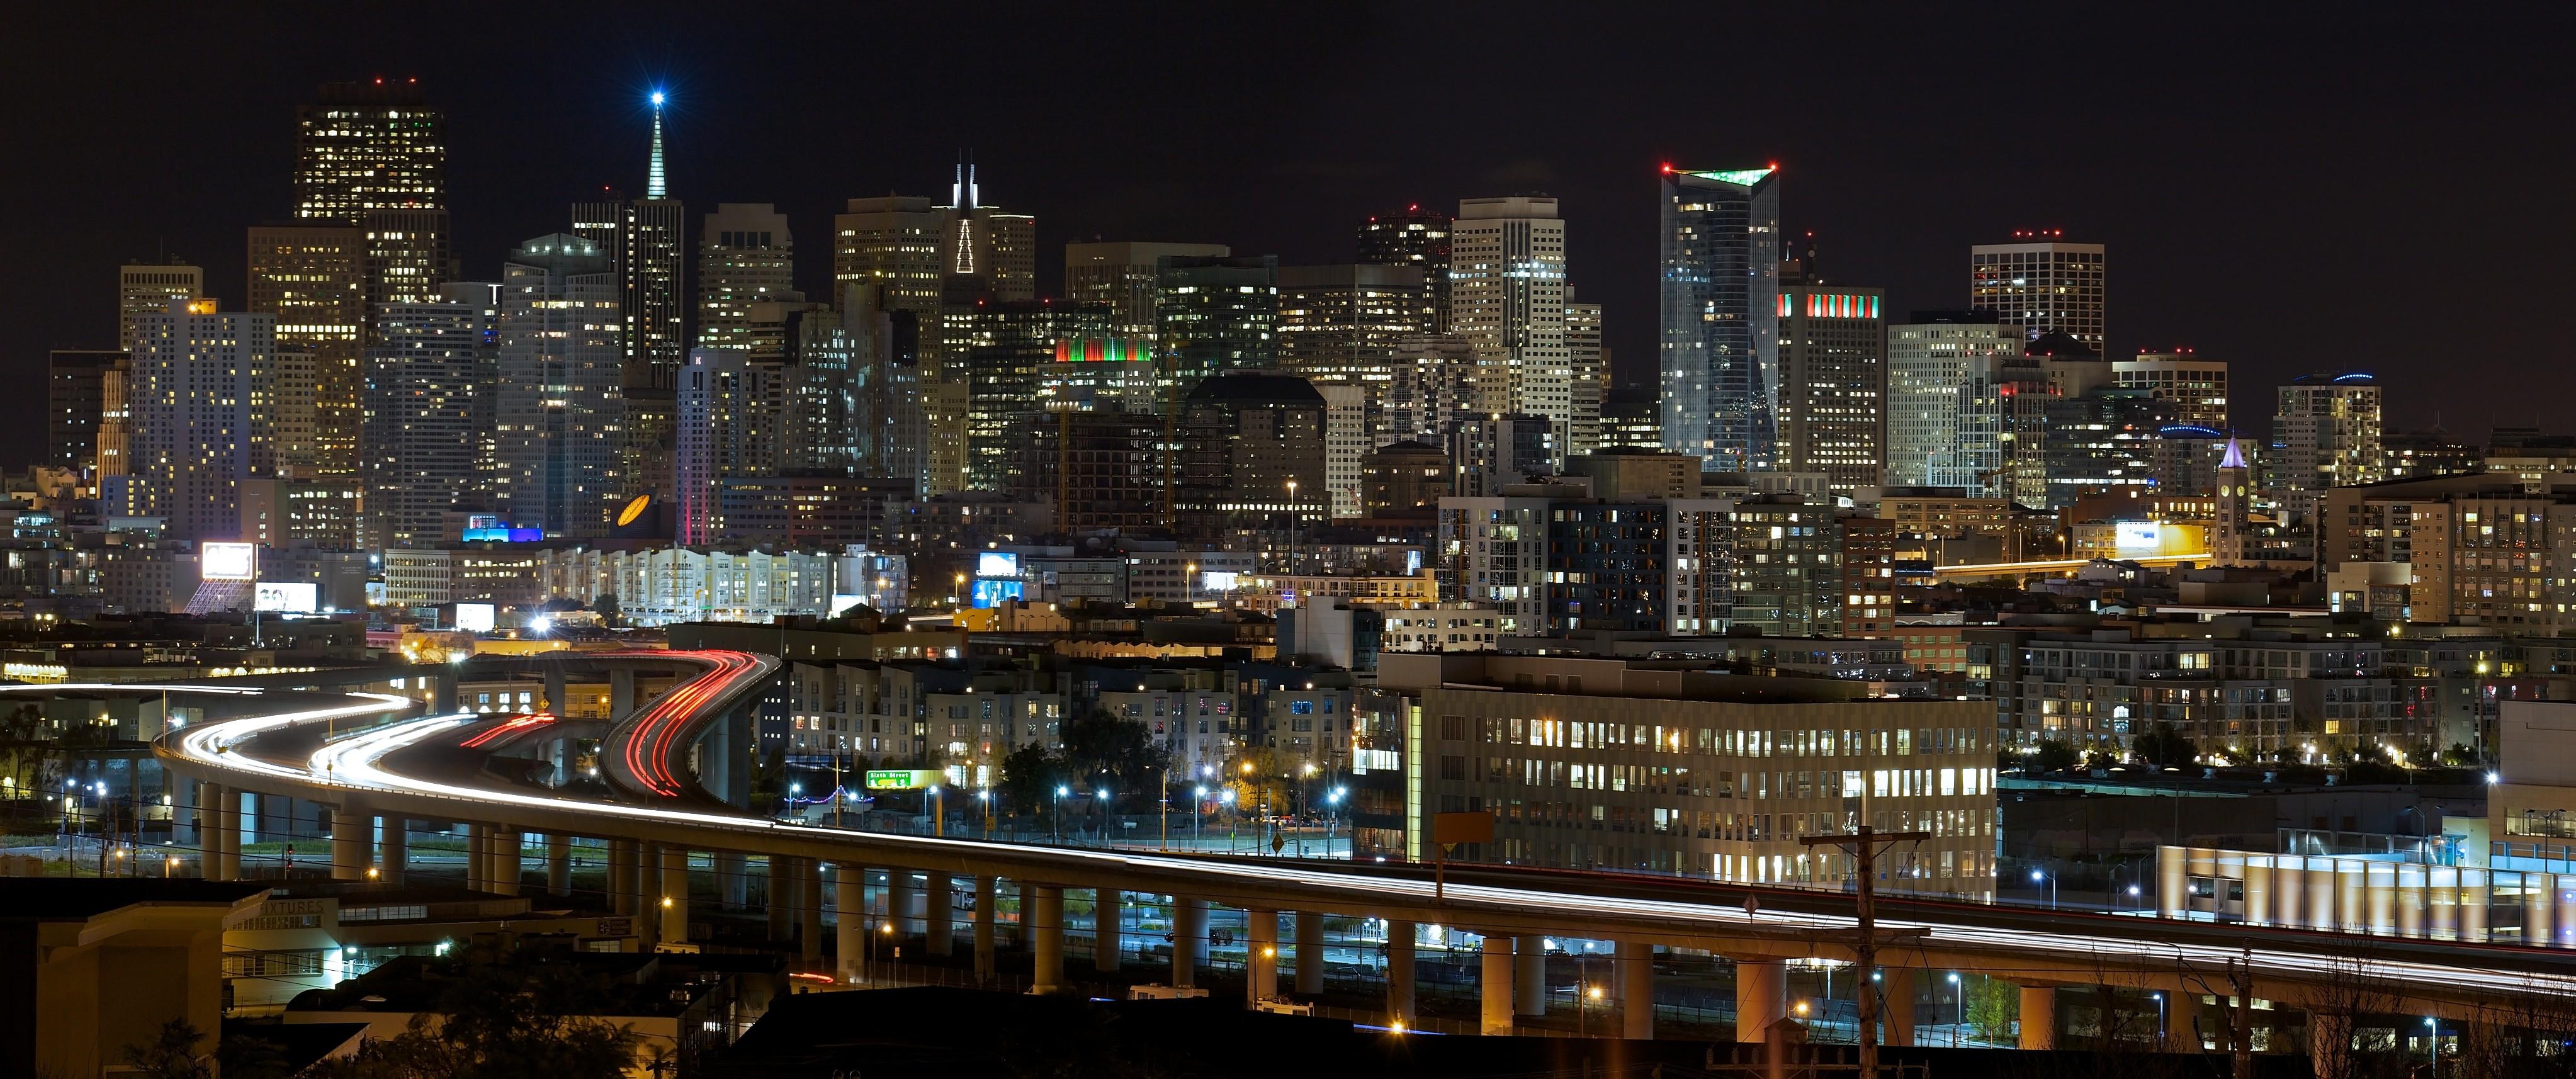 General 4092x1714 city night road San Francisco California